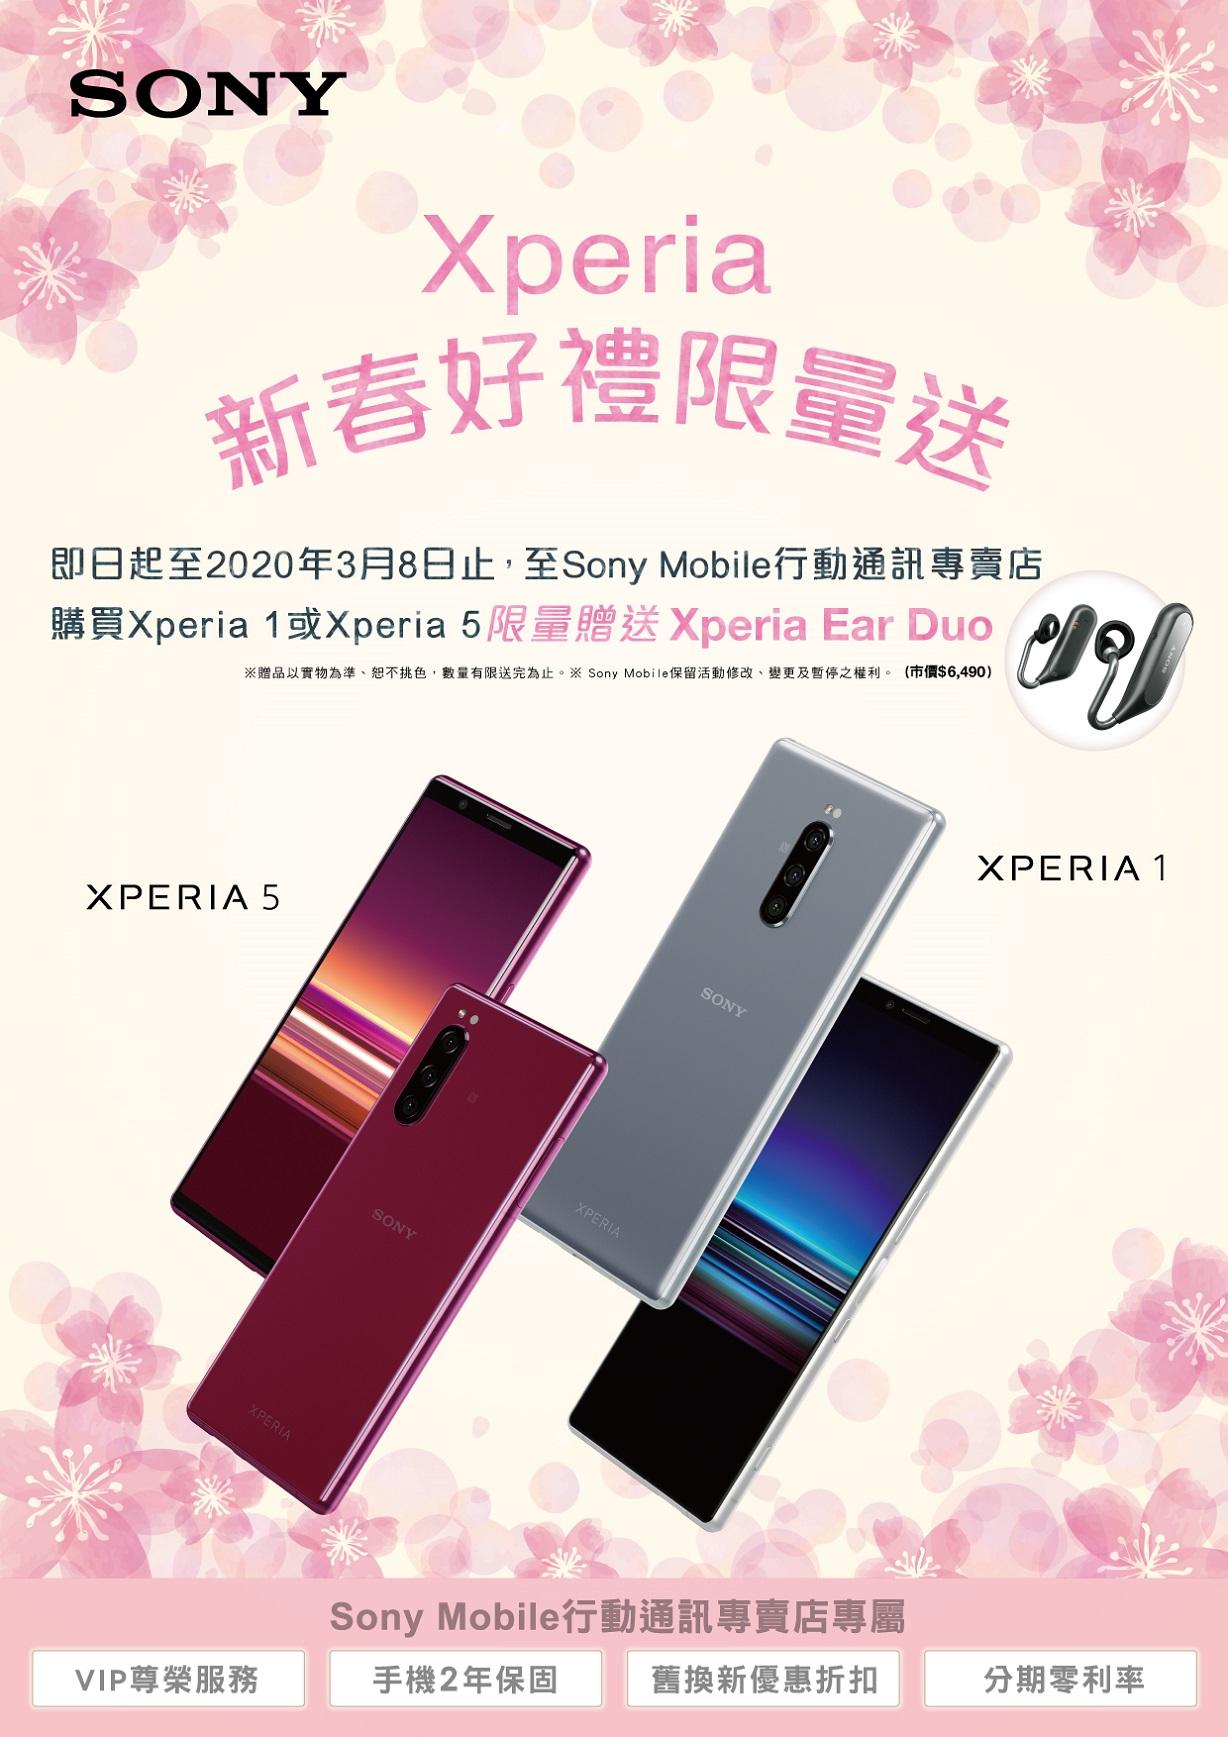 Xperia 1、Xperia 5高調放閃,行動通訊專賣店購買加贈Xperia Ear Duo